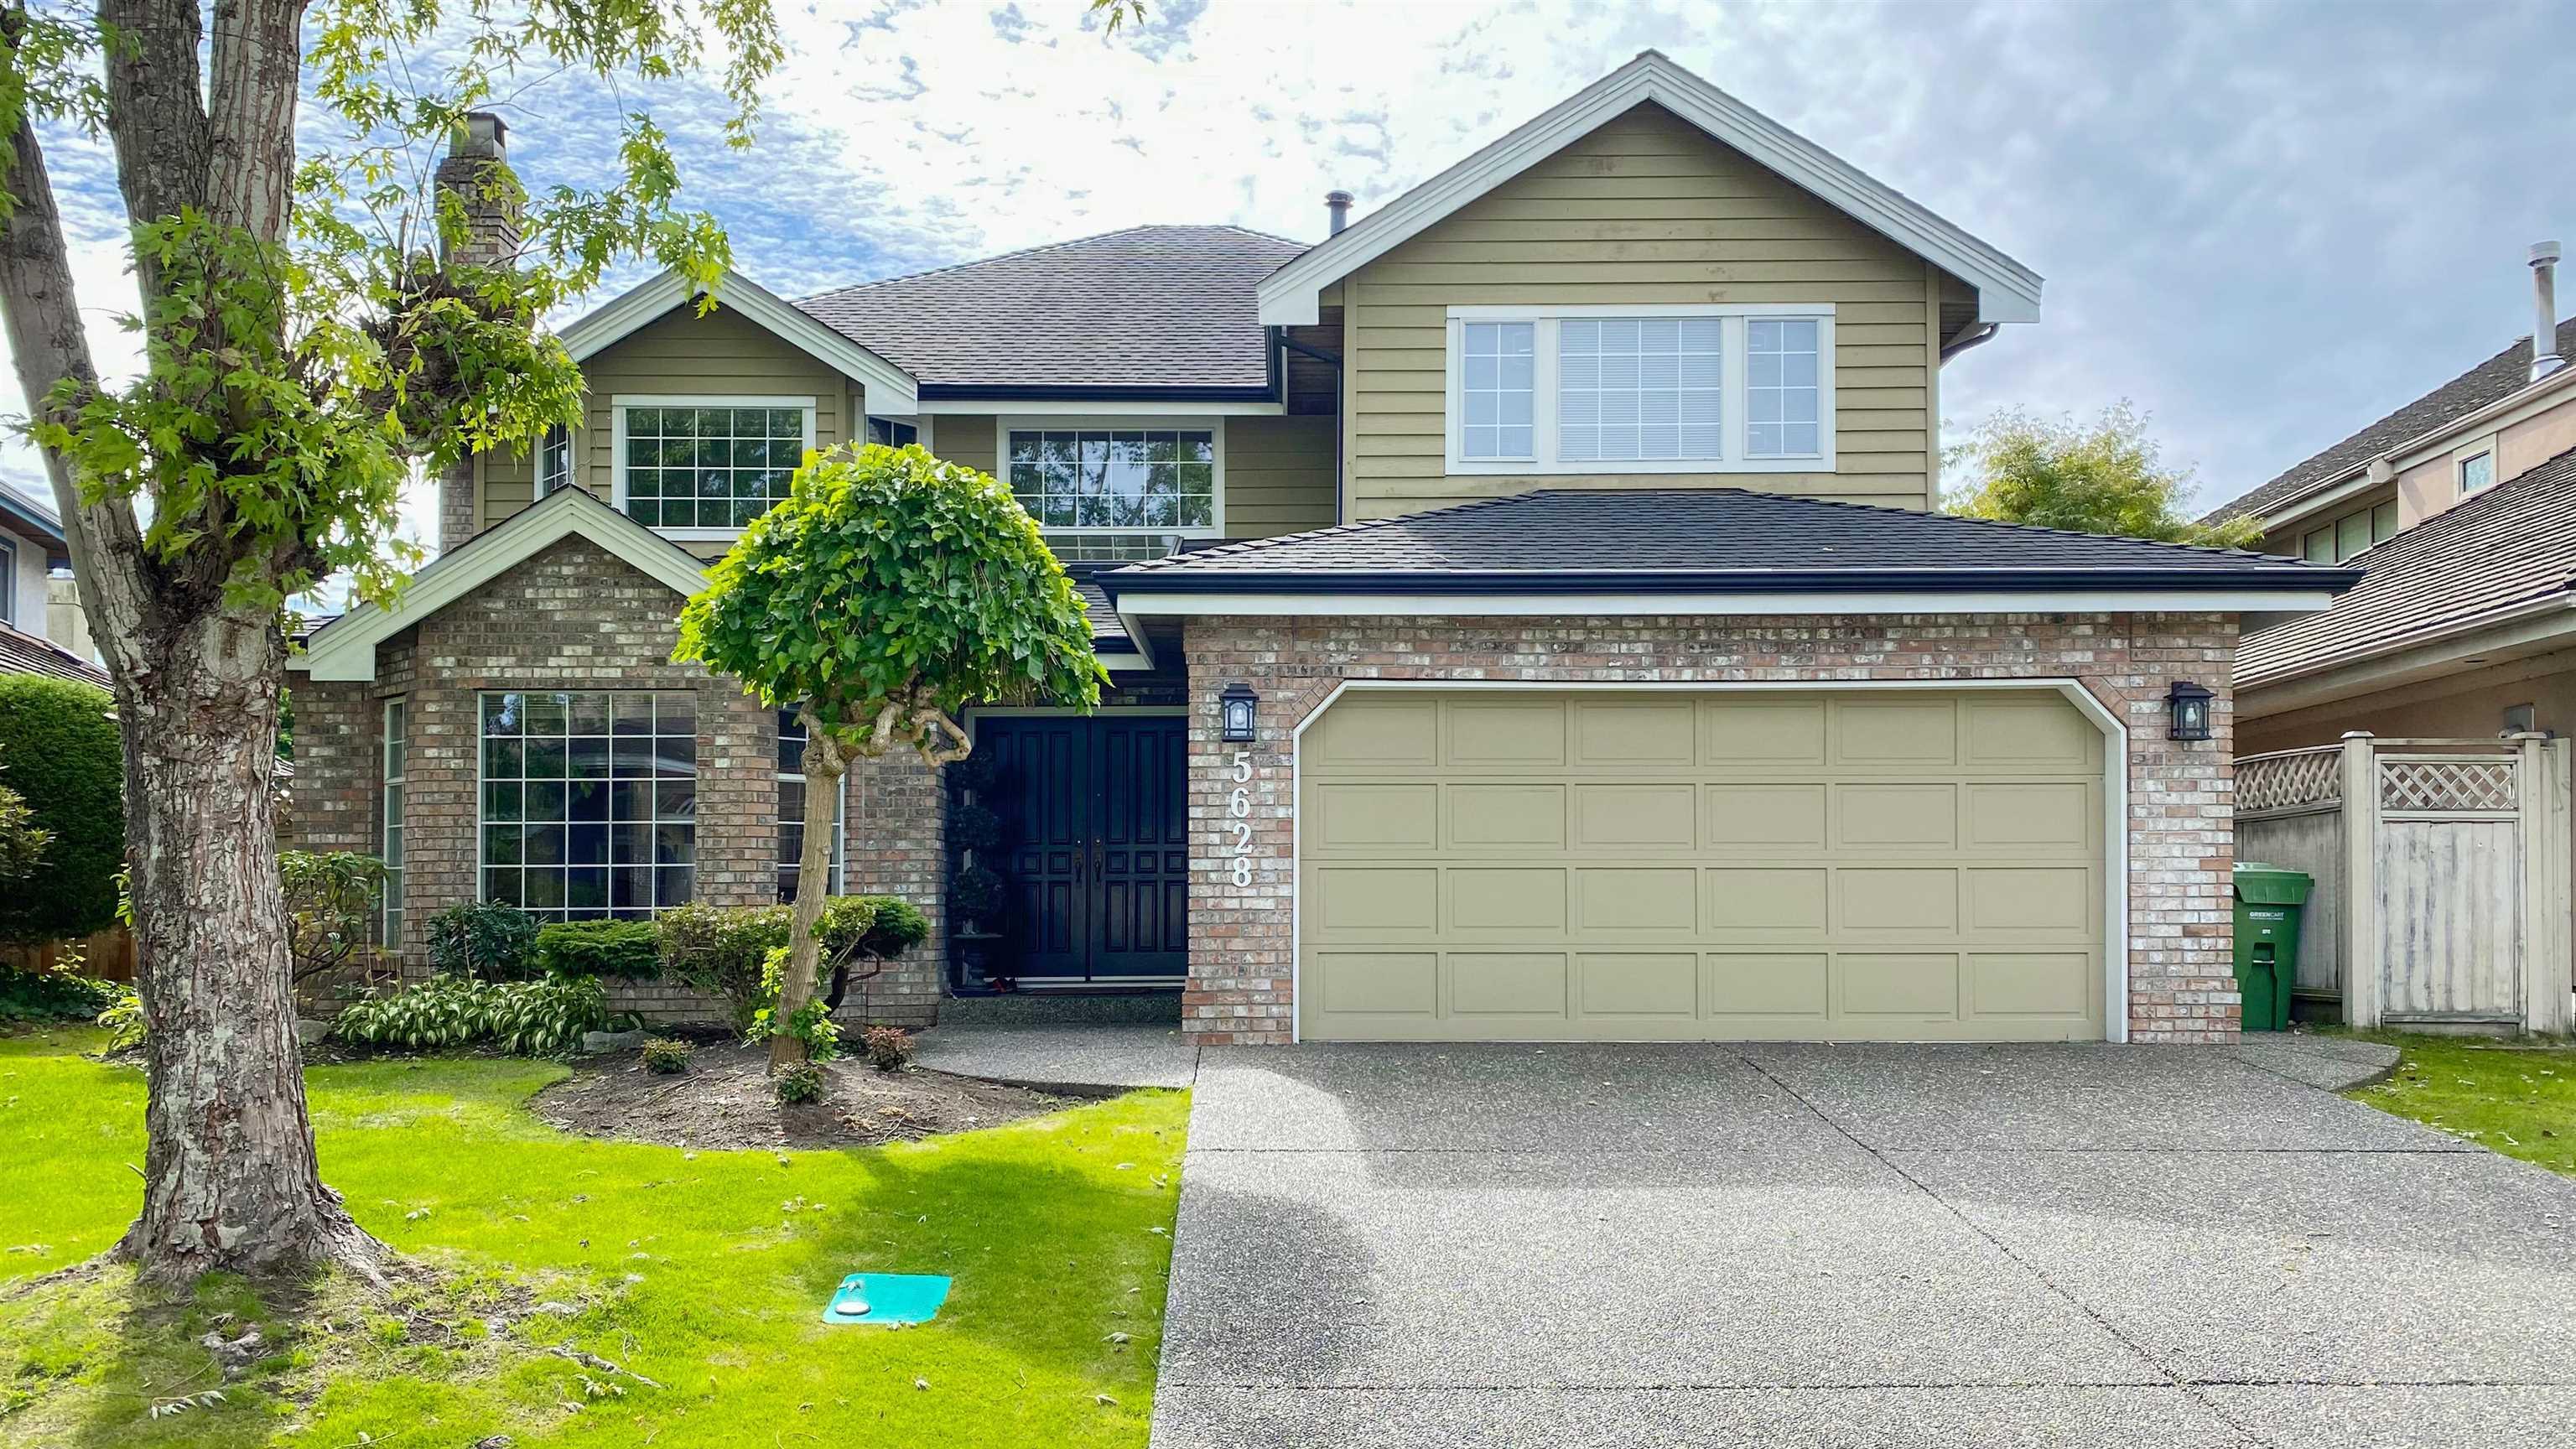 5628 CORNWALL DRIVE - Terra Nova House/Single Family for sale, 4 Bedrooms (R2622407)